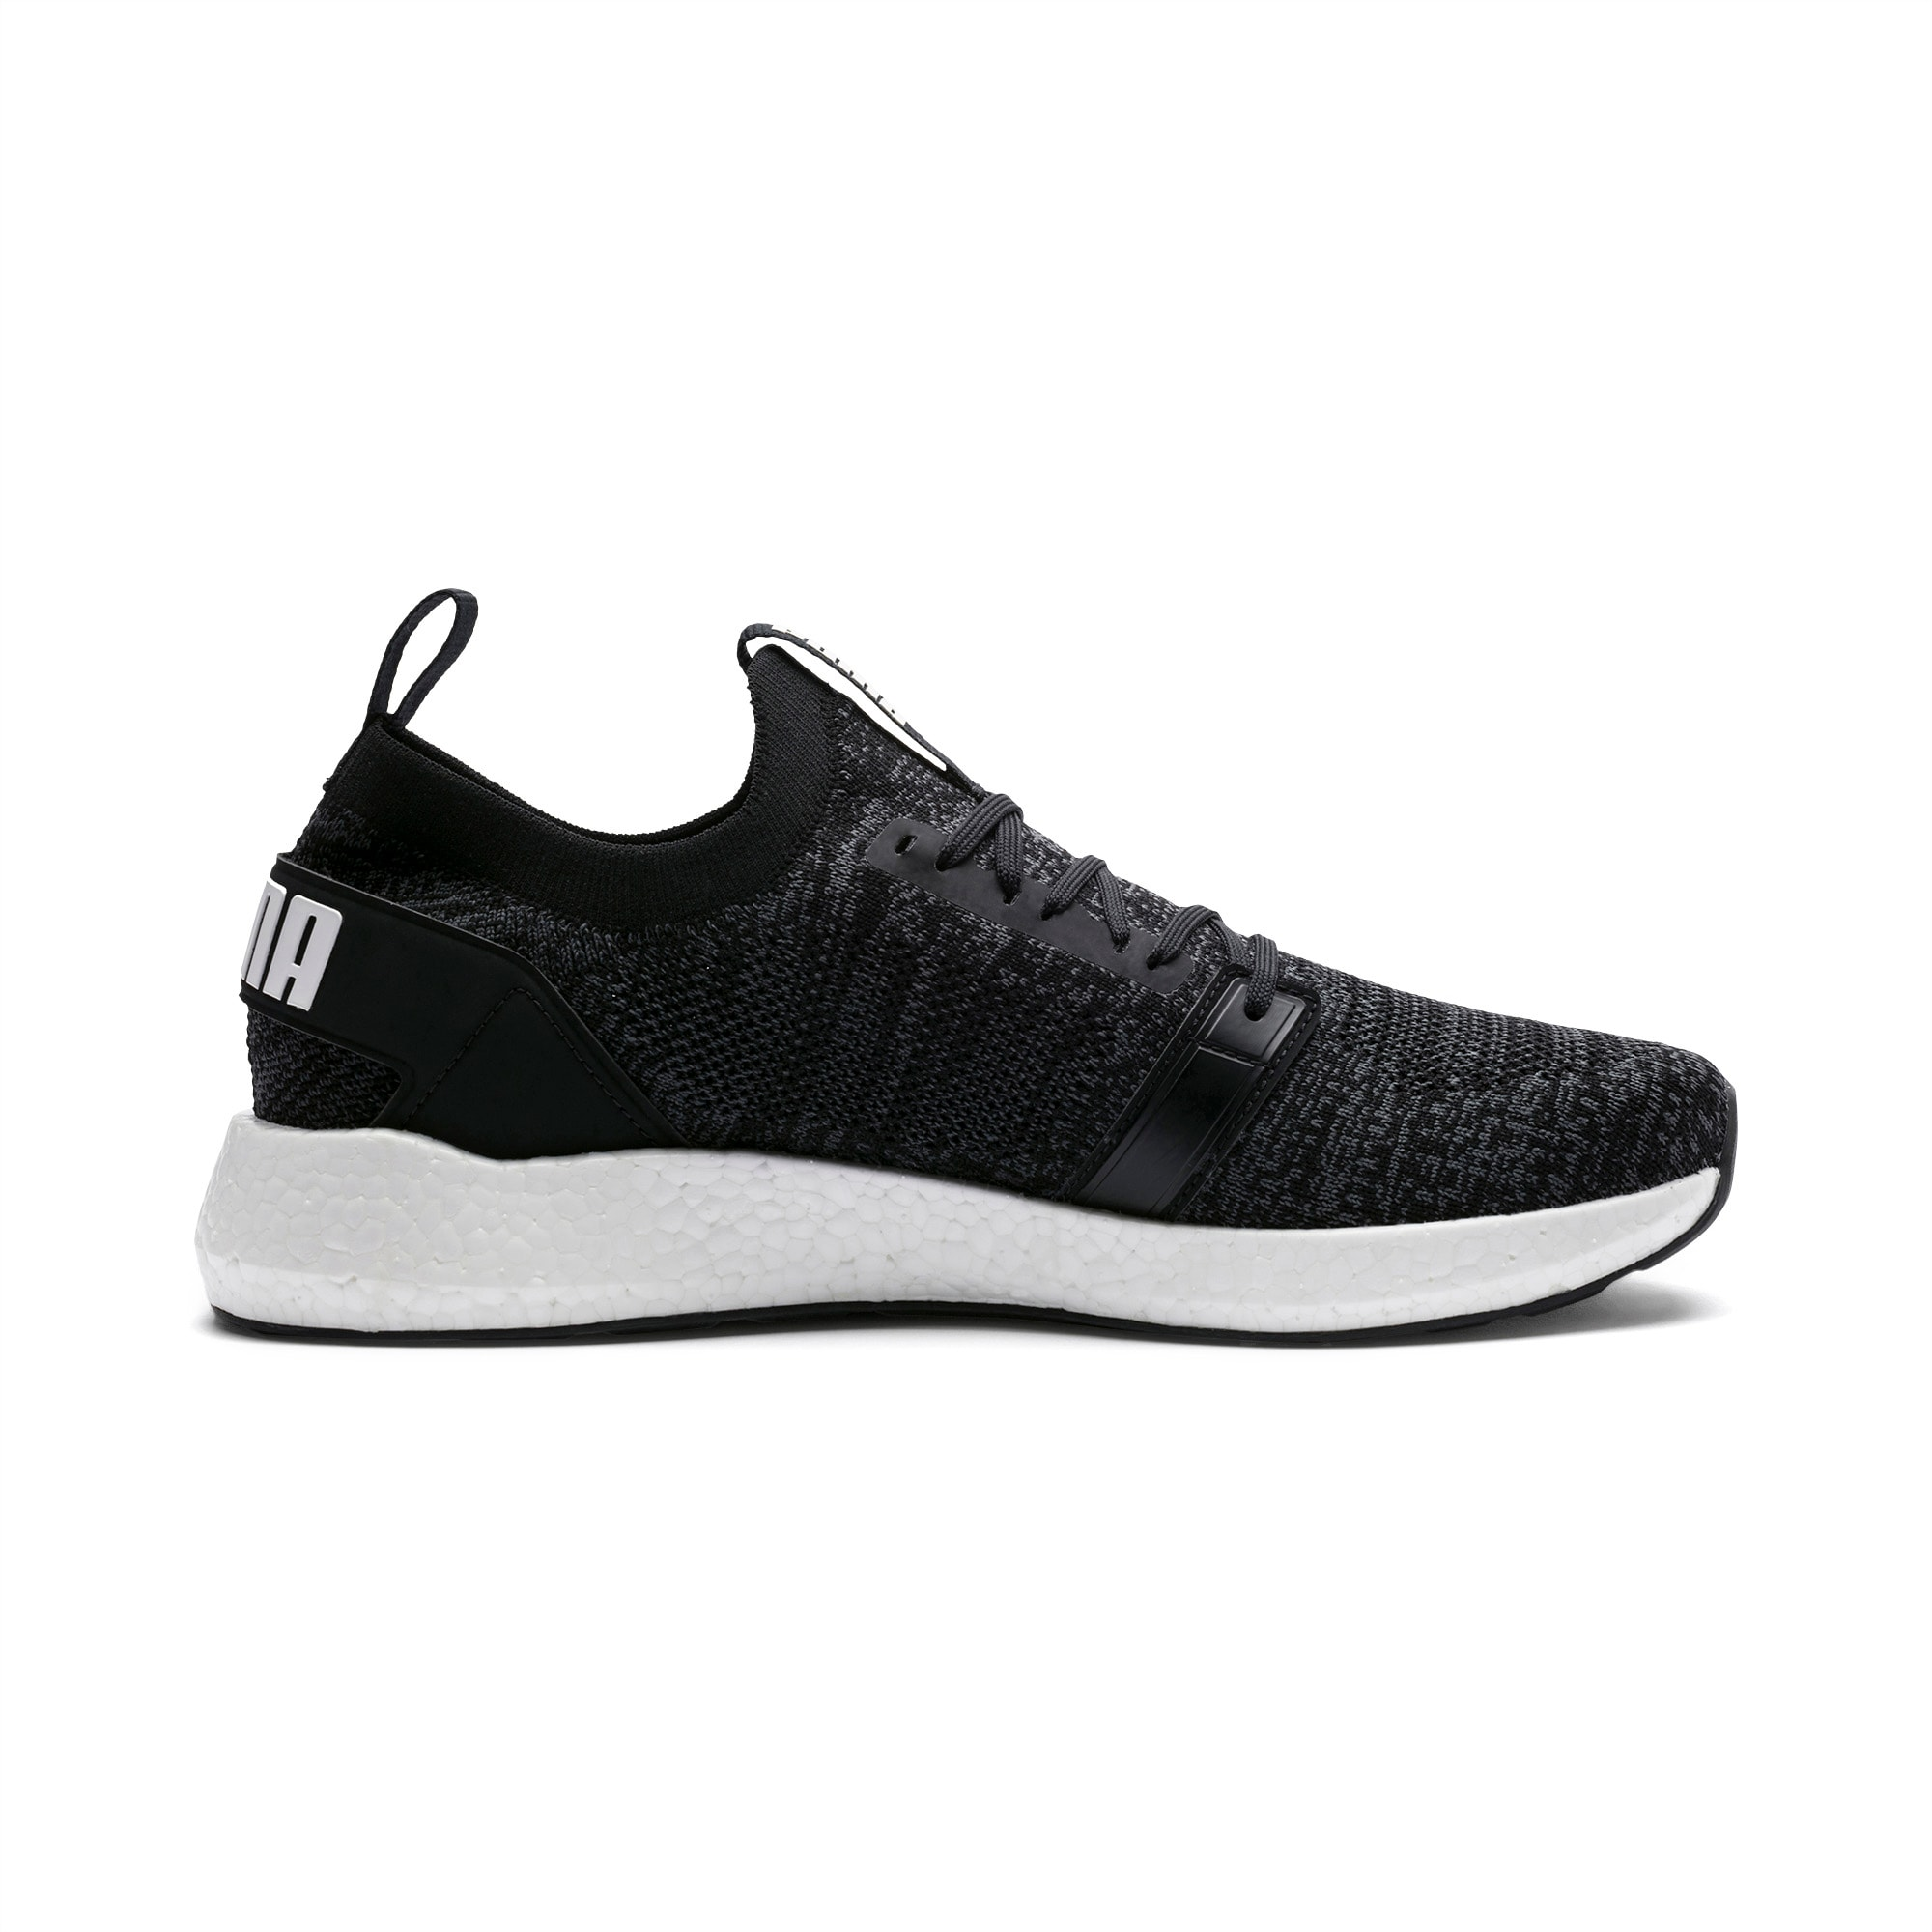 Aburrido Rareza Puñado  NRGY NEKO ENGINEER KNIT Men's Running Shoes | Puma Black-Iron Gate | PUMA  Shoes | PUMA